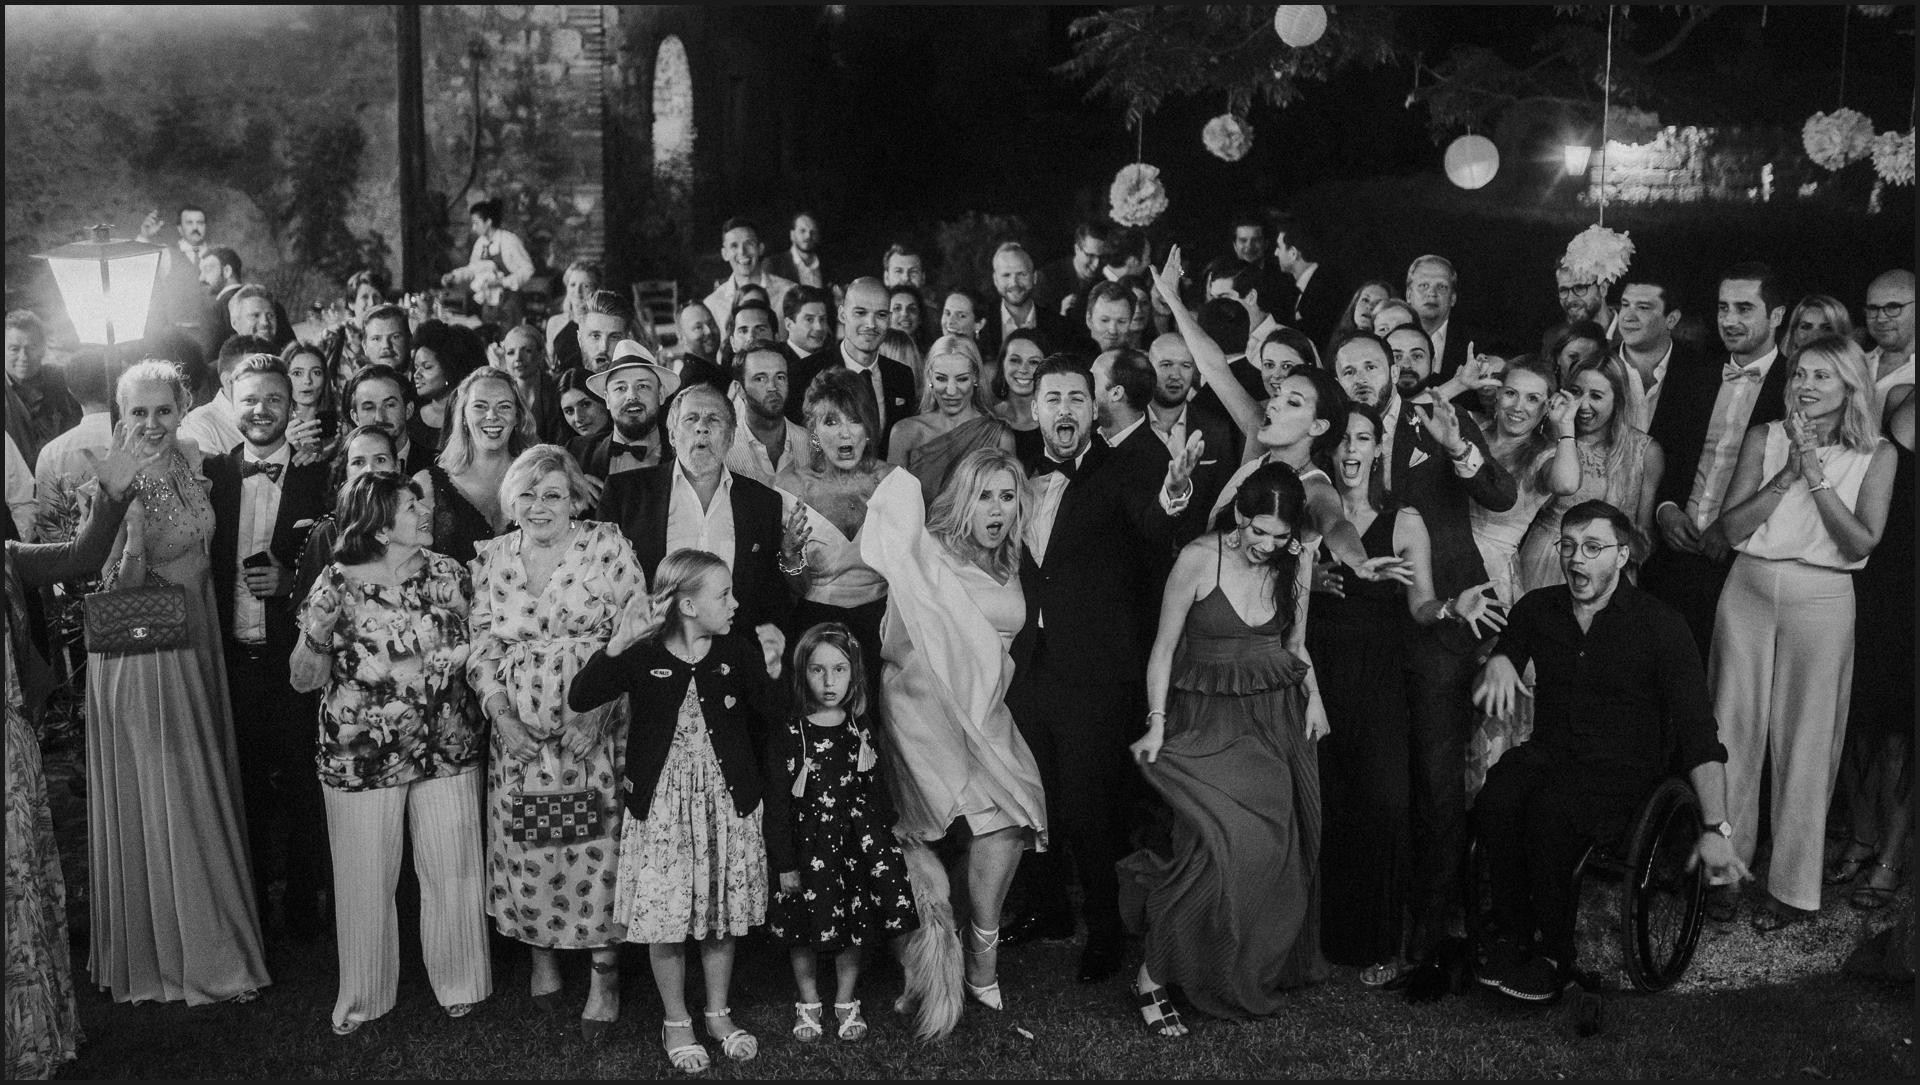 borgo di tragliata, wedding, rome, wedding in rome, black and white, group picures, wedding guests